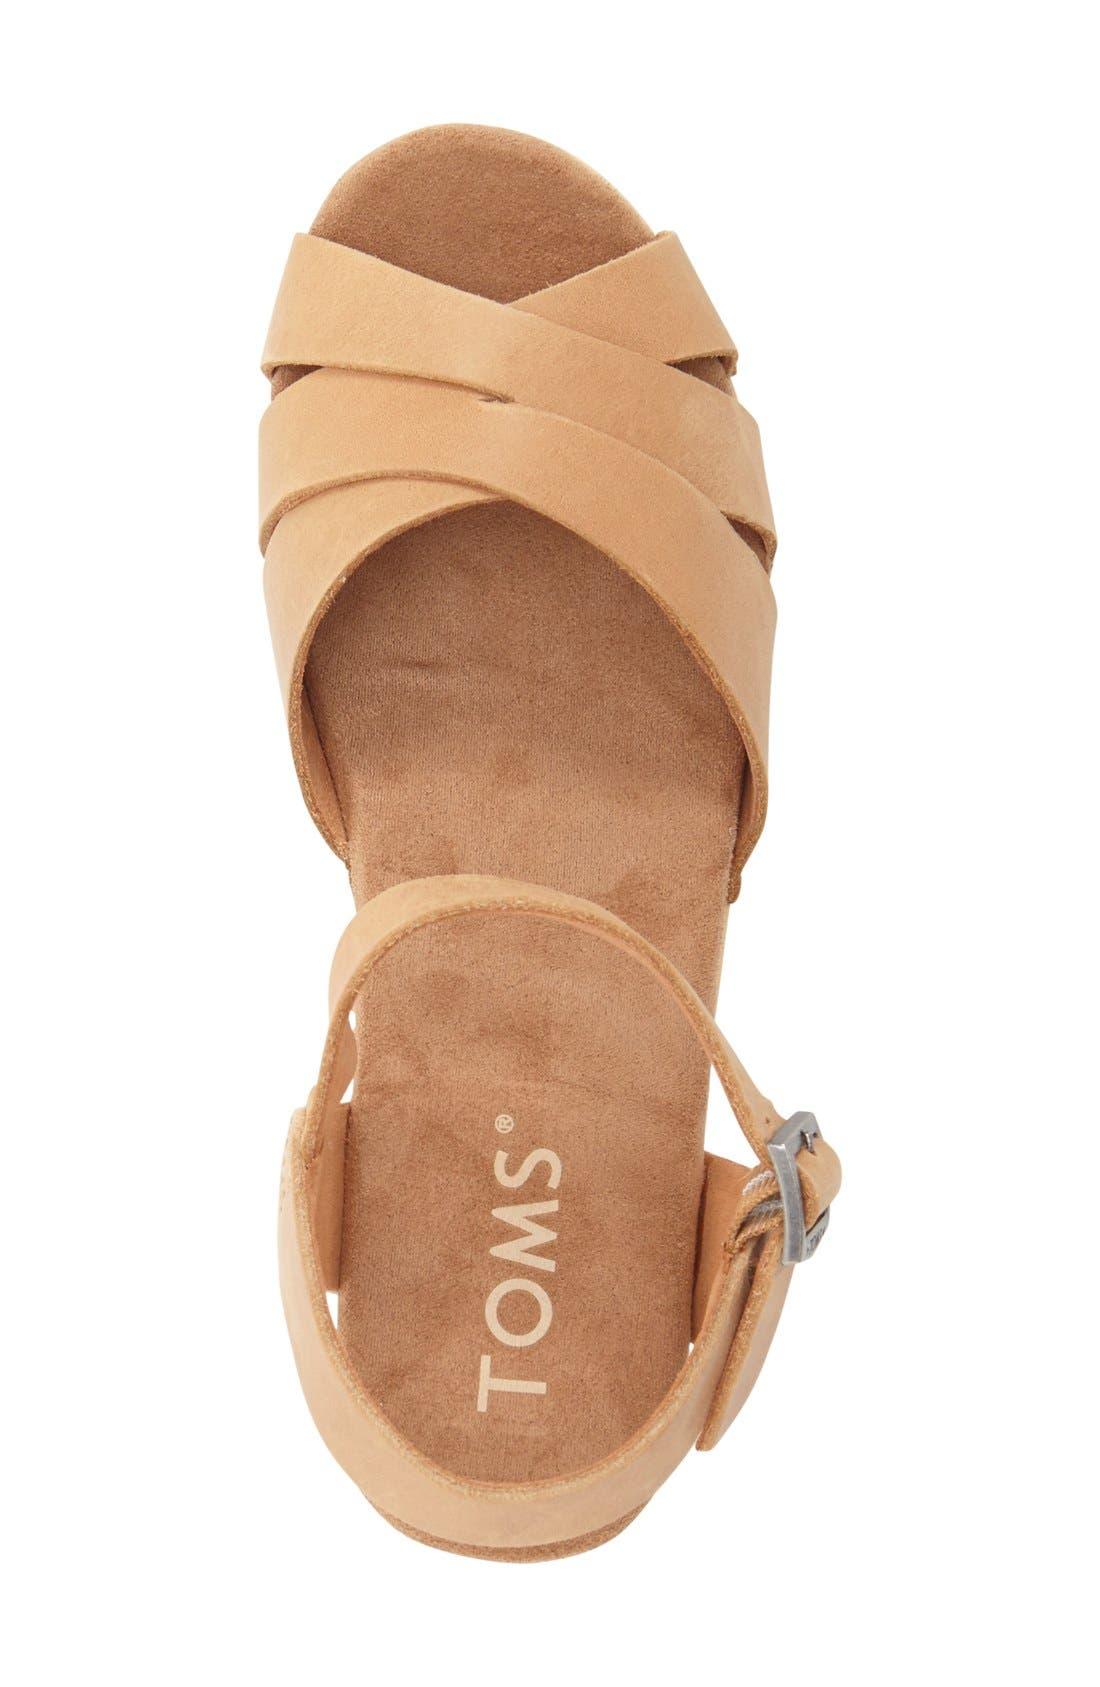 Alternate Image 3  - TOMS 'Beatrix' Leather Sandal (Women)